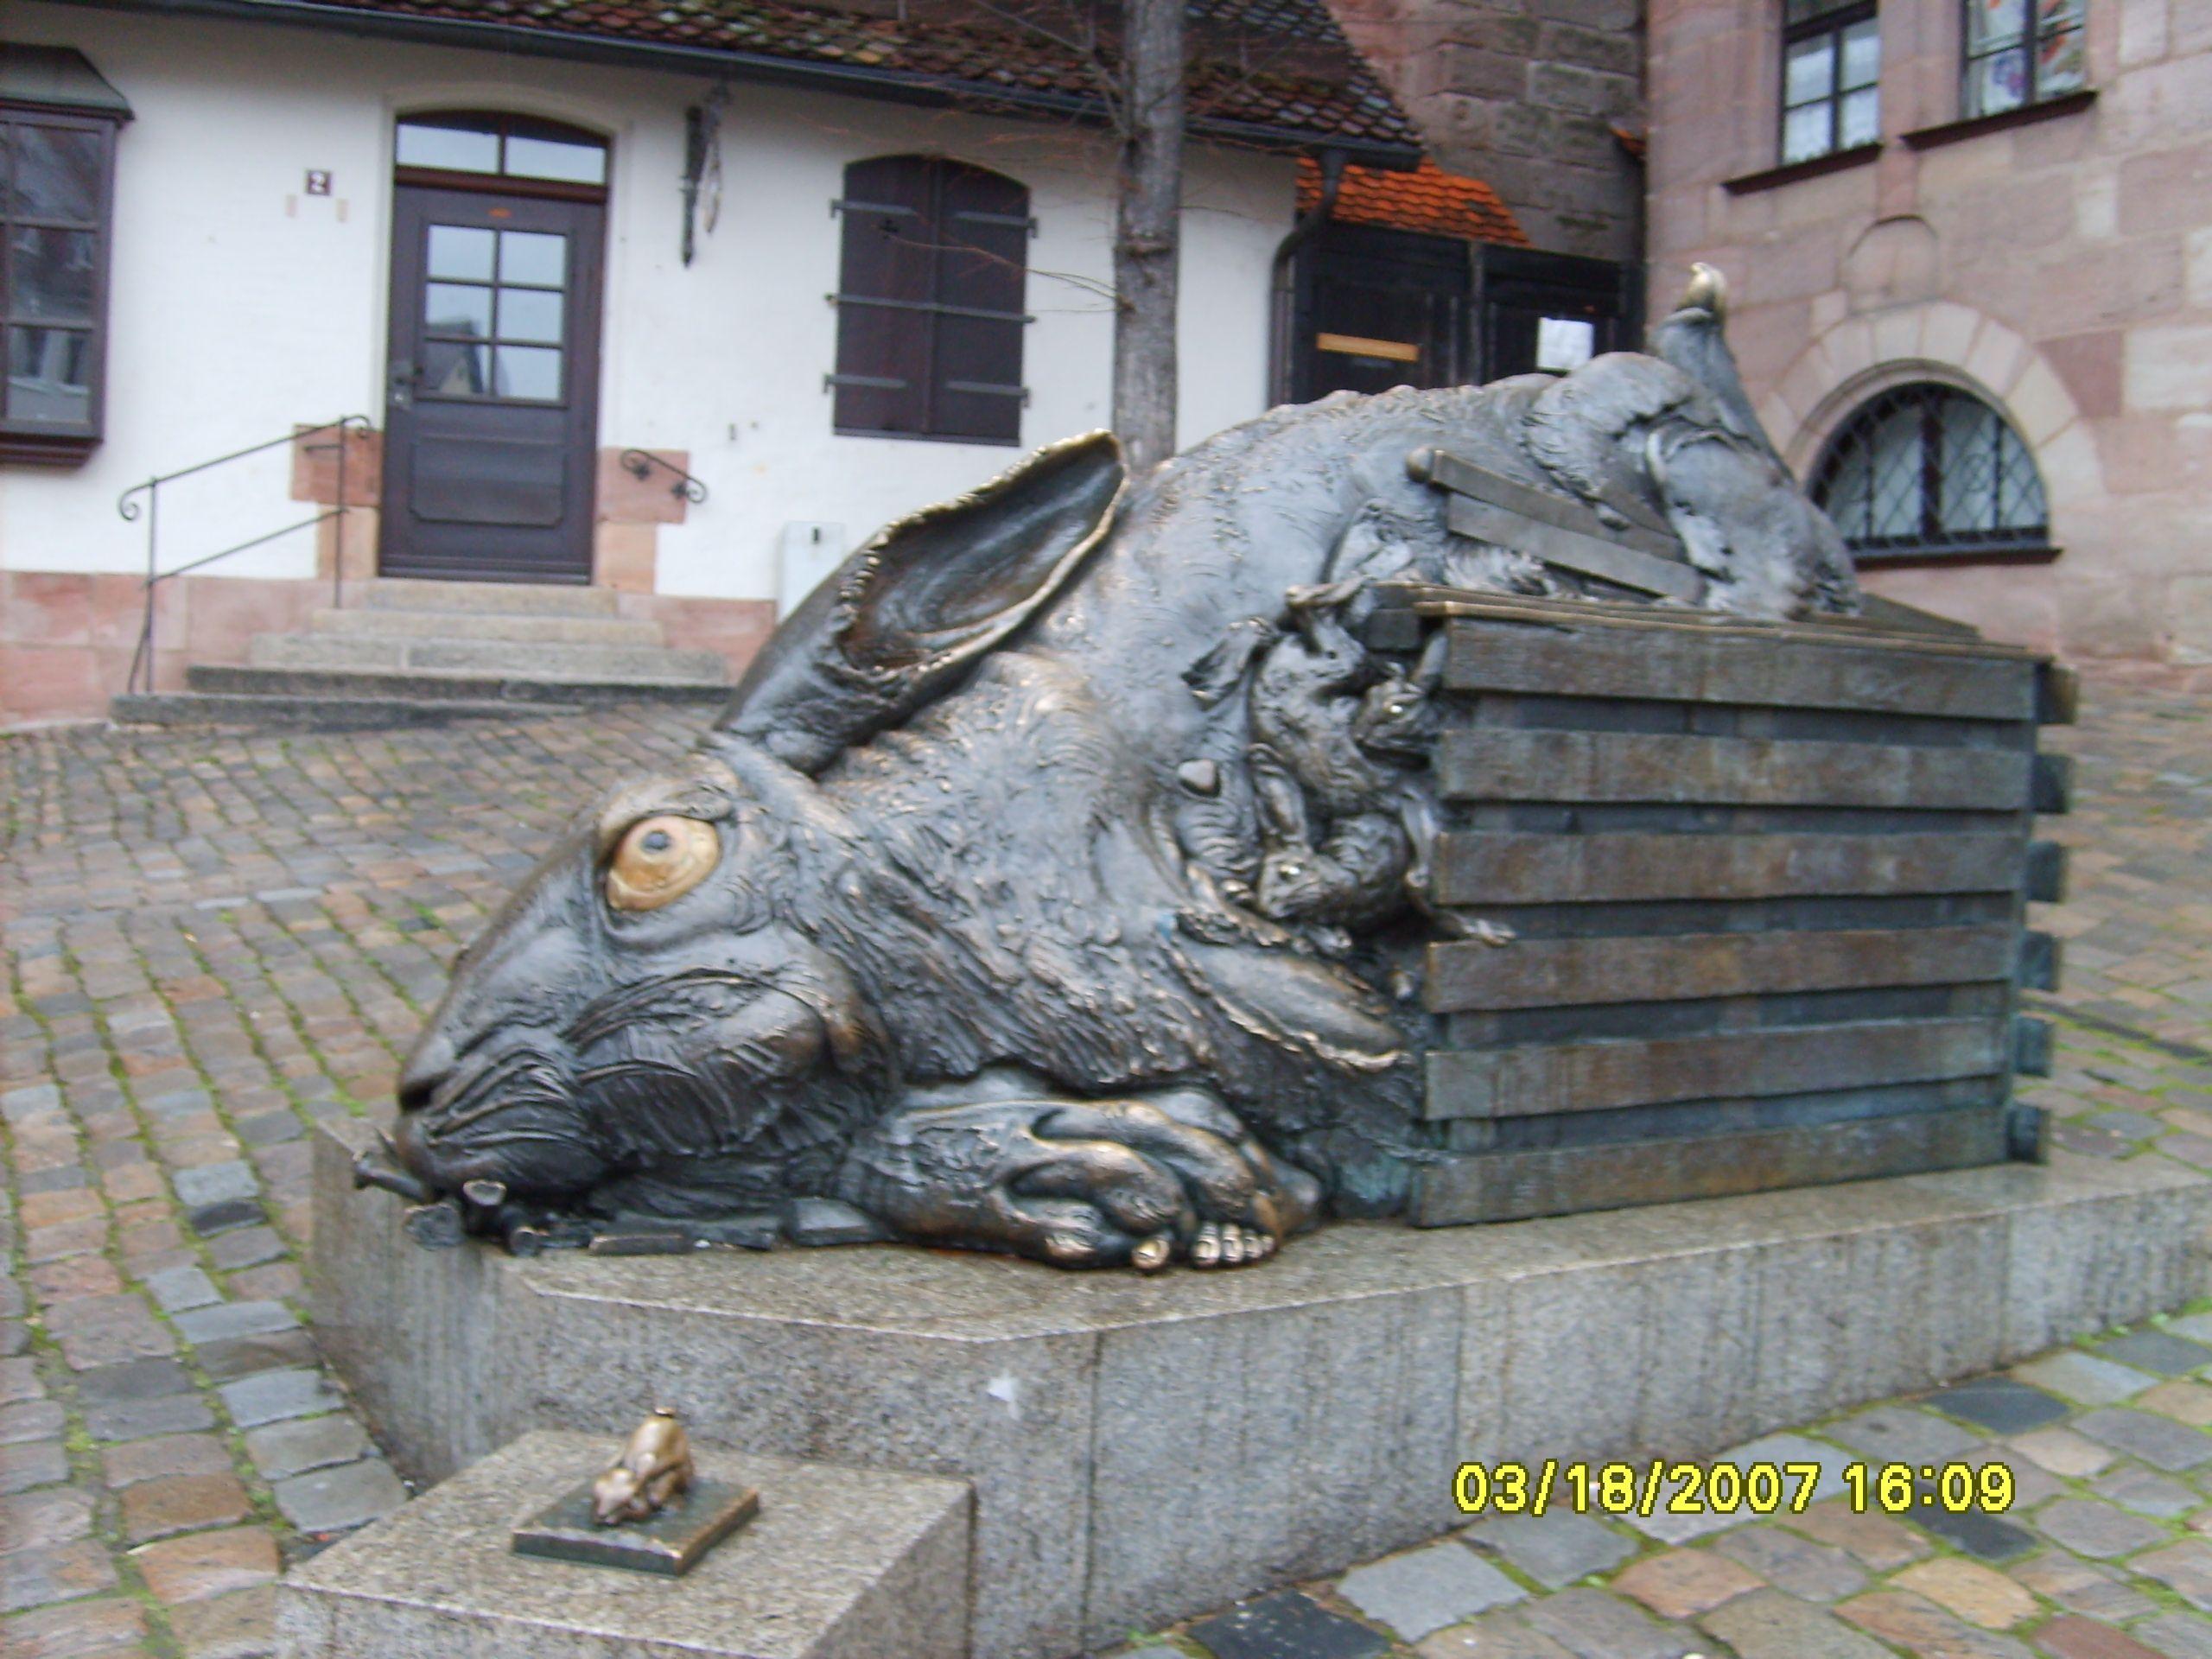 Kulonleges forgo szobrok 793 - Weird Rabbit Statue